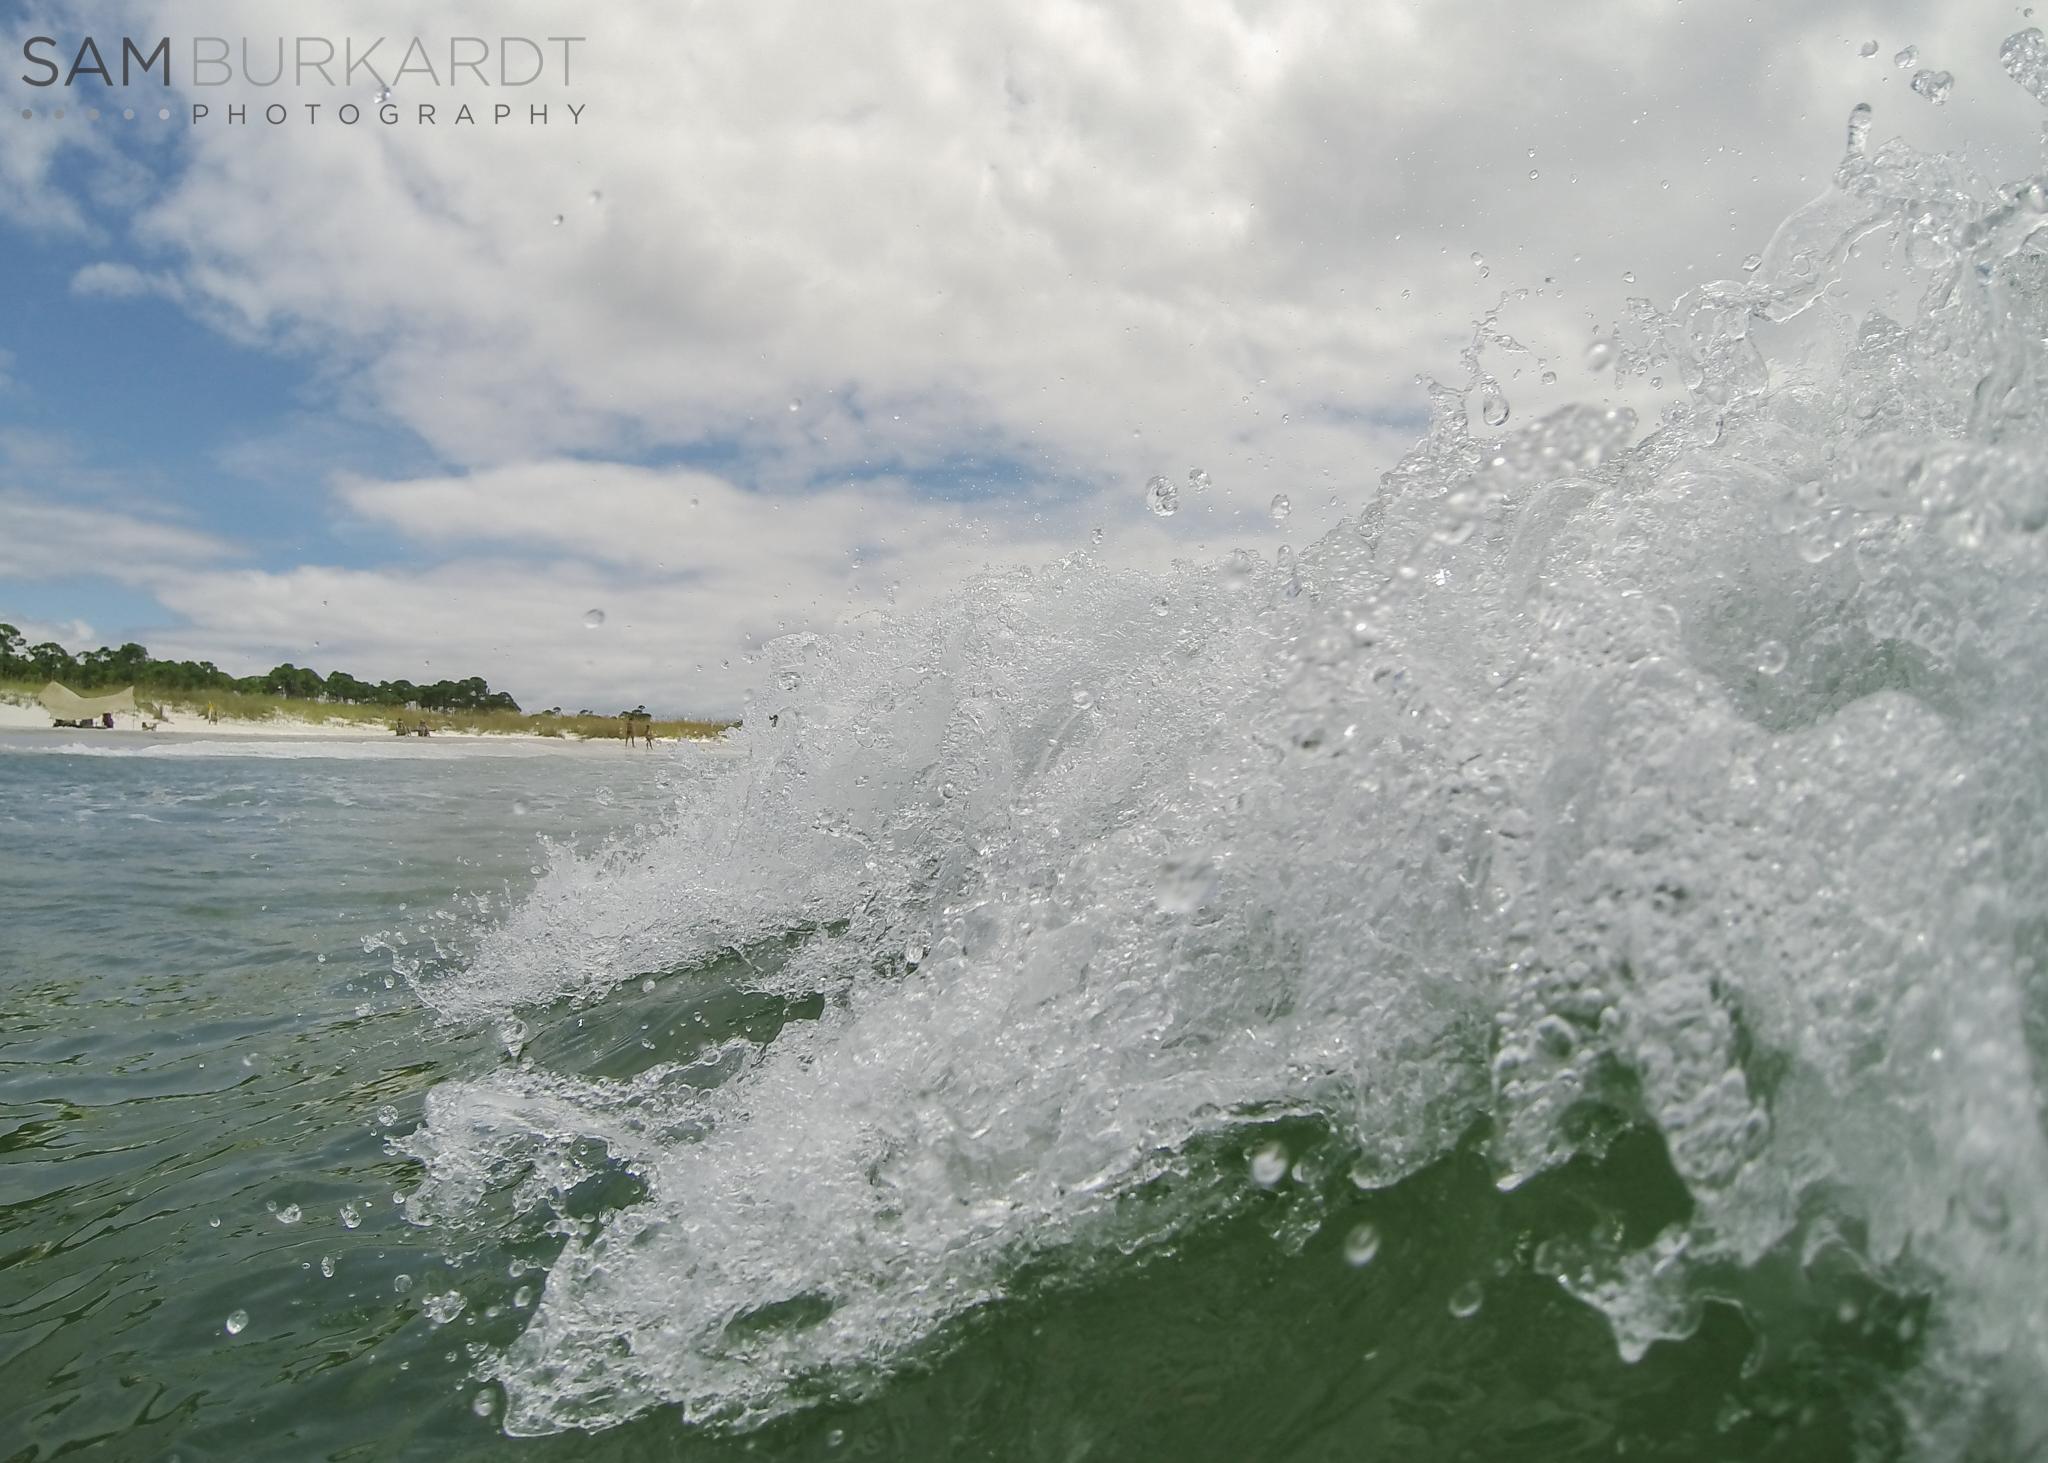 samburkardt_engagement_vacation_beach_cape_san_blas_florida_camping_gopro_0027.jpg